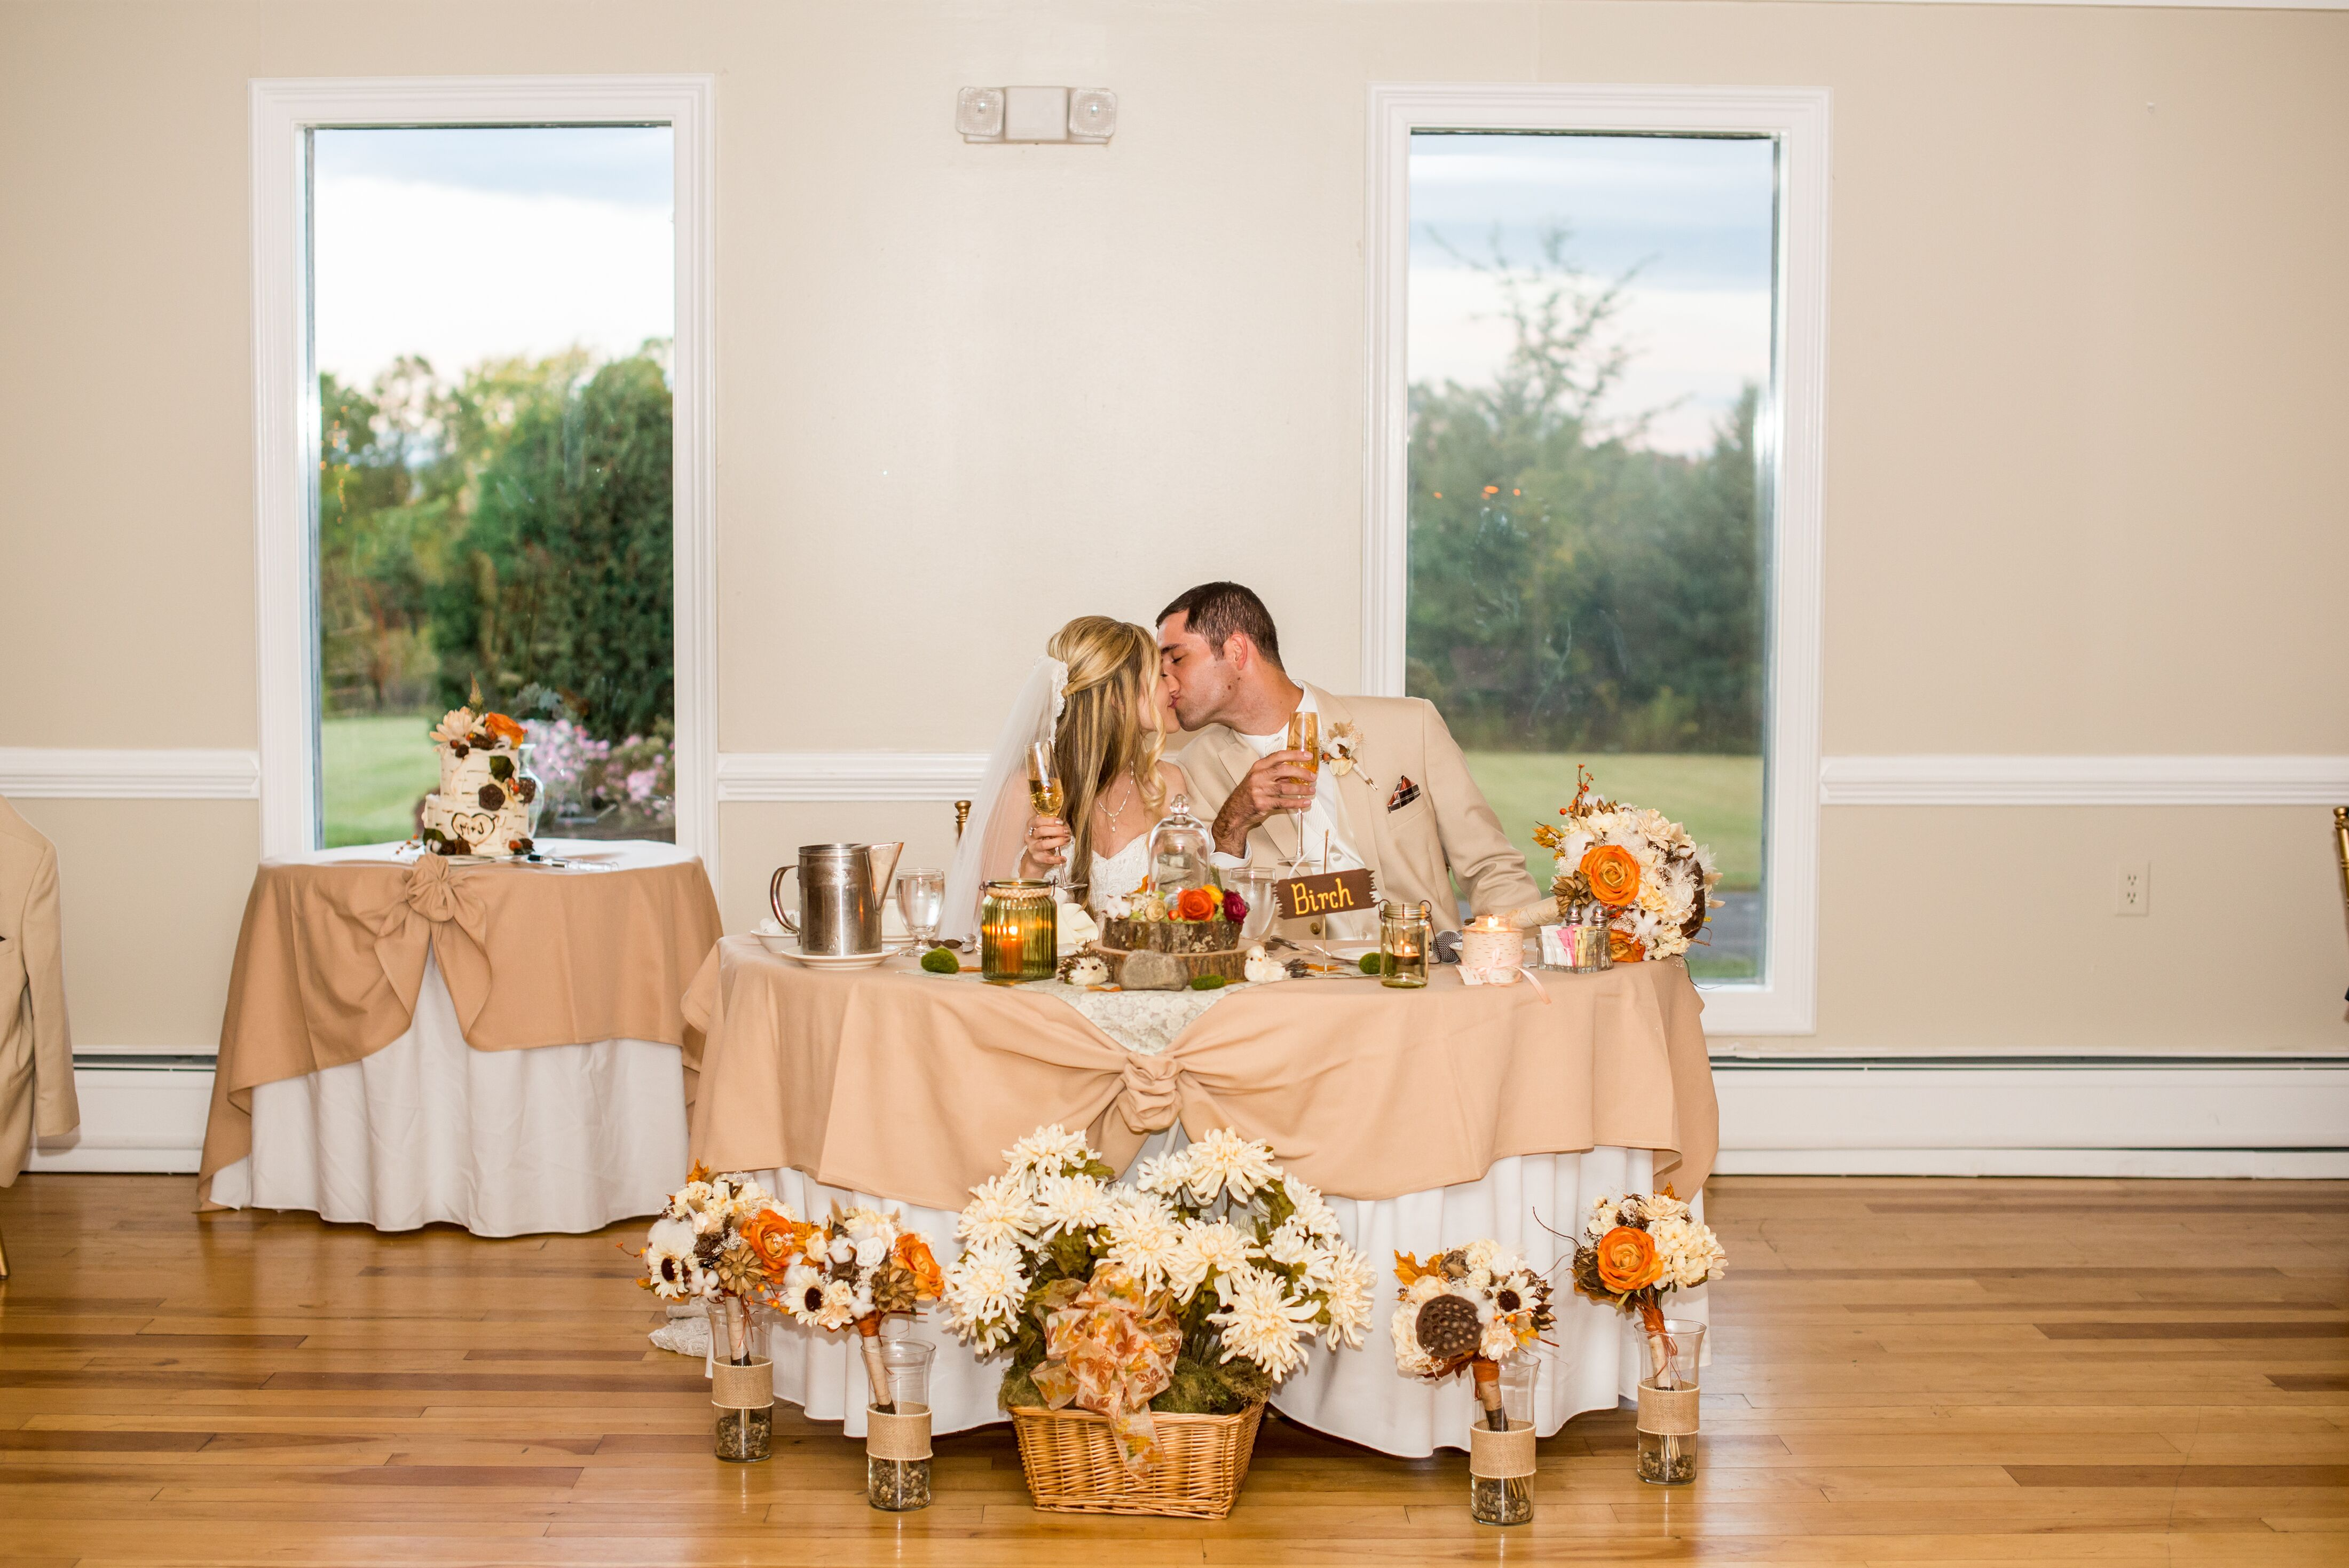 Settles Hill Tree Farm Wedding Reception Venue